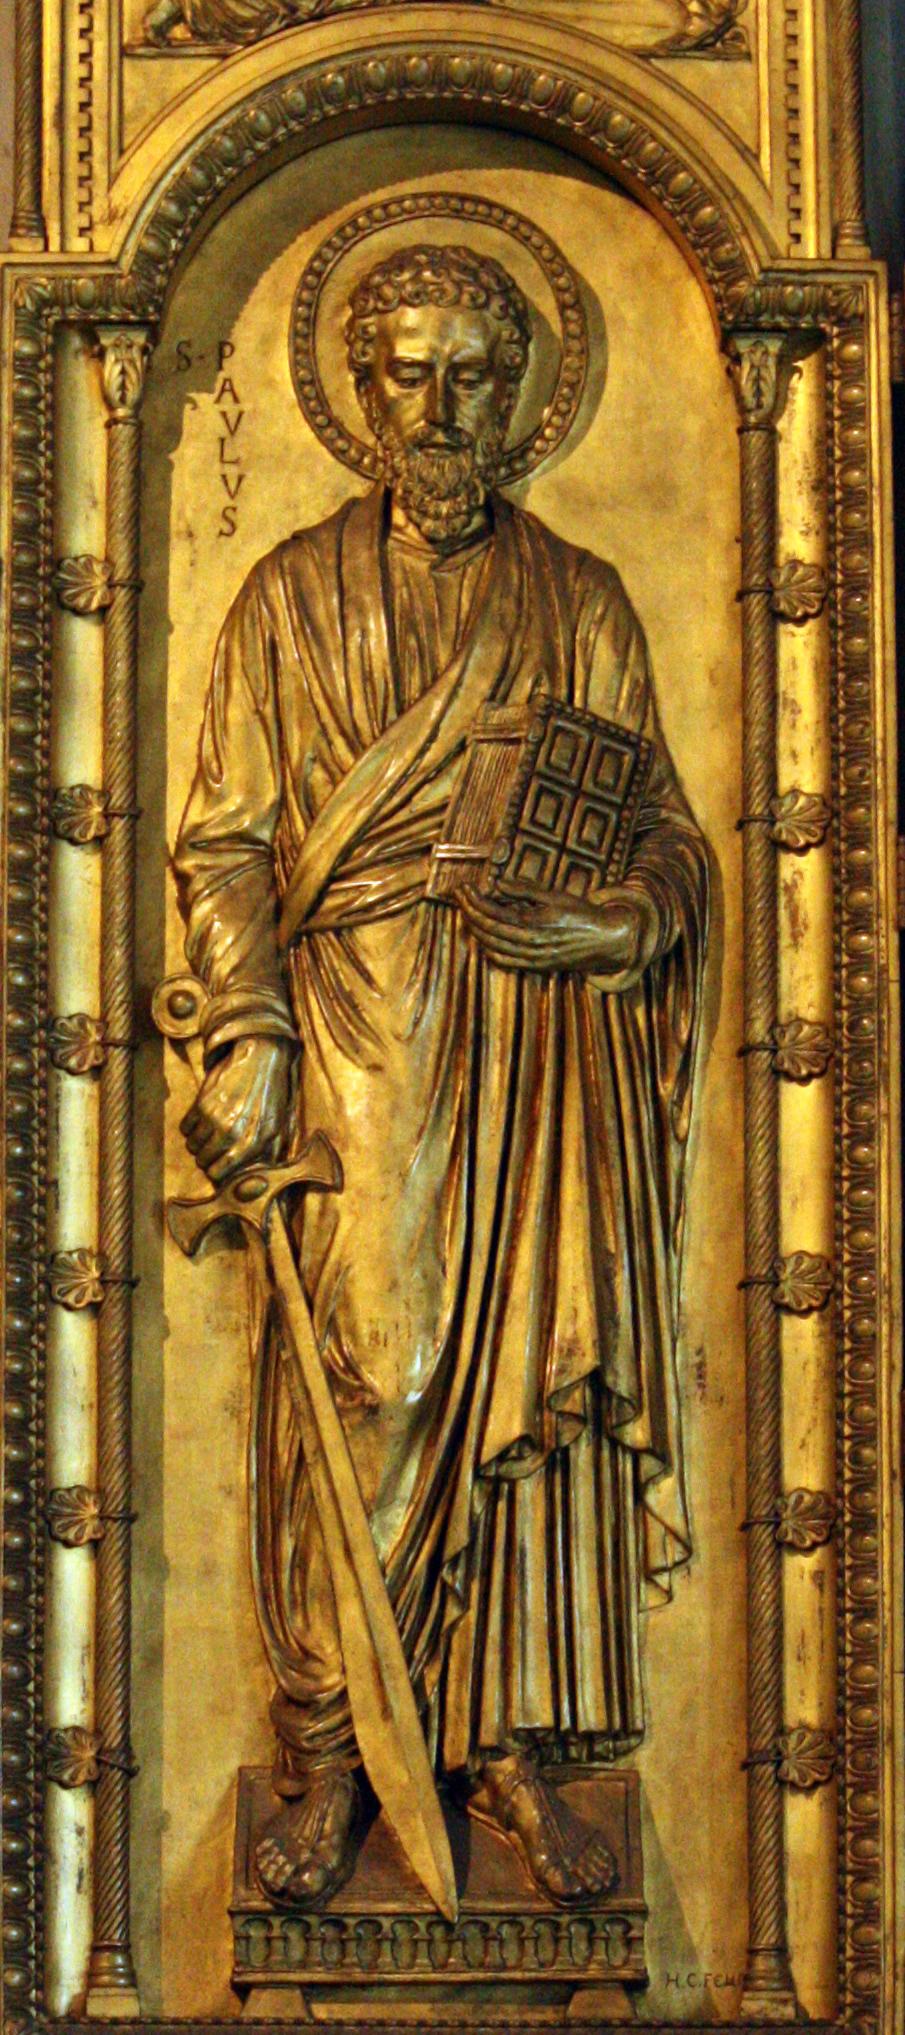 Saint Paul Apostle dans immagini sacre saint-paul-the-apostle-08